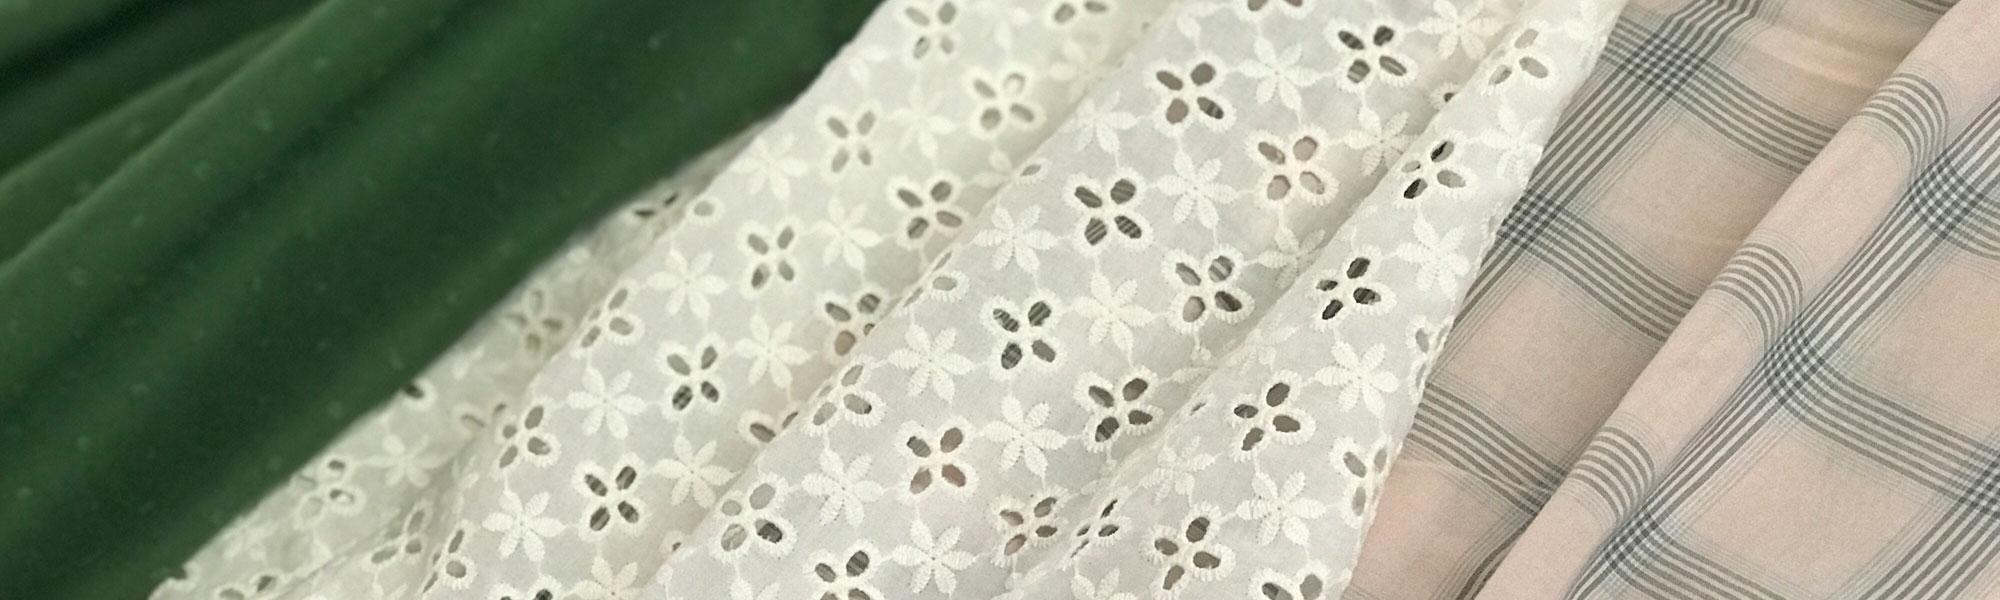 Cotton lawn, shirting, and eyelet